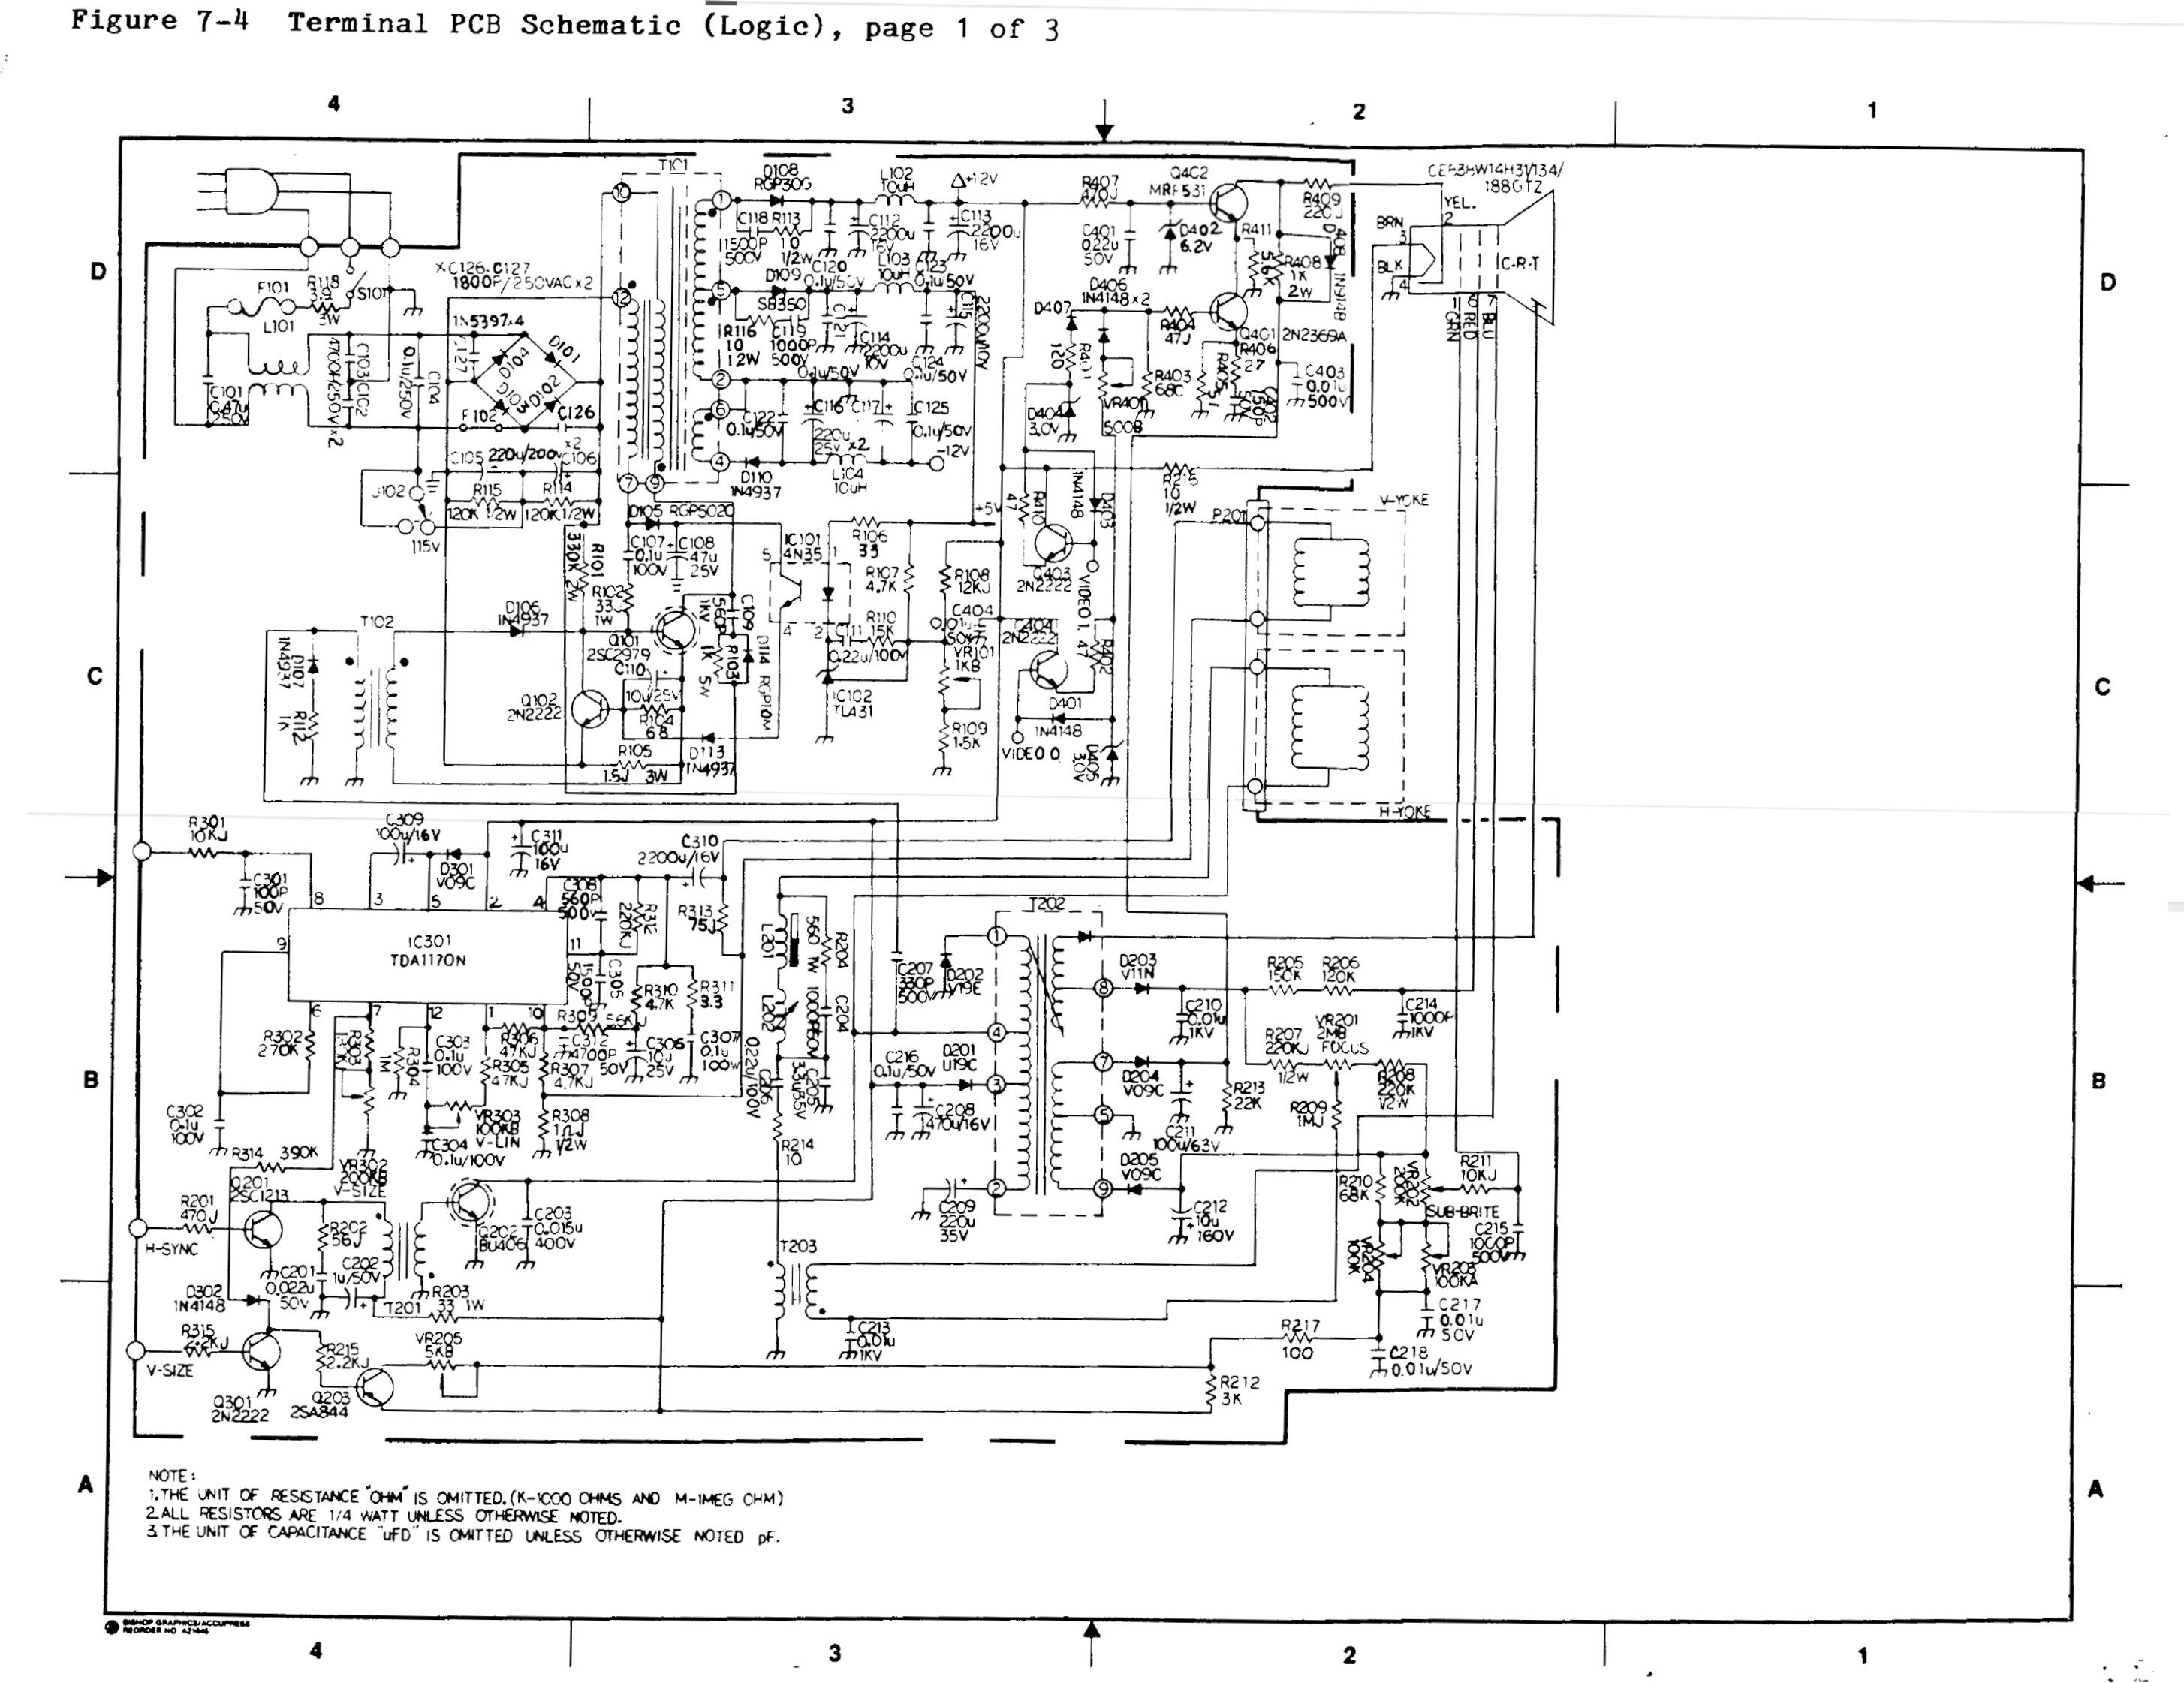 dezbaz u0026 39 s 19v2000 monitor page